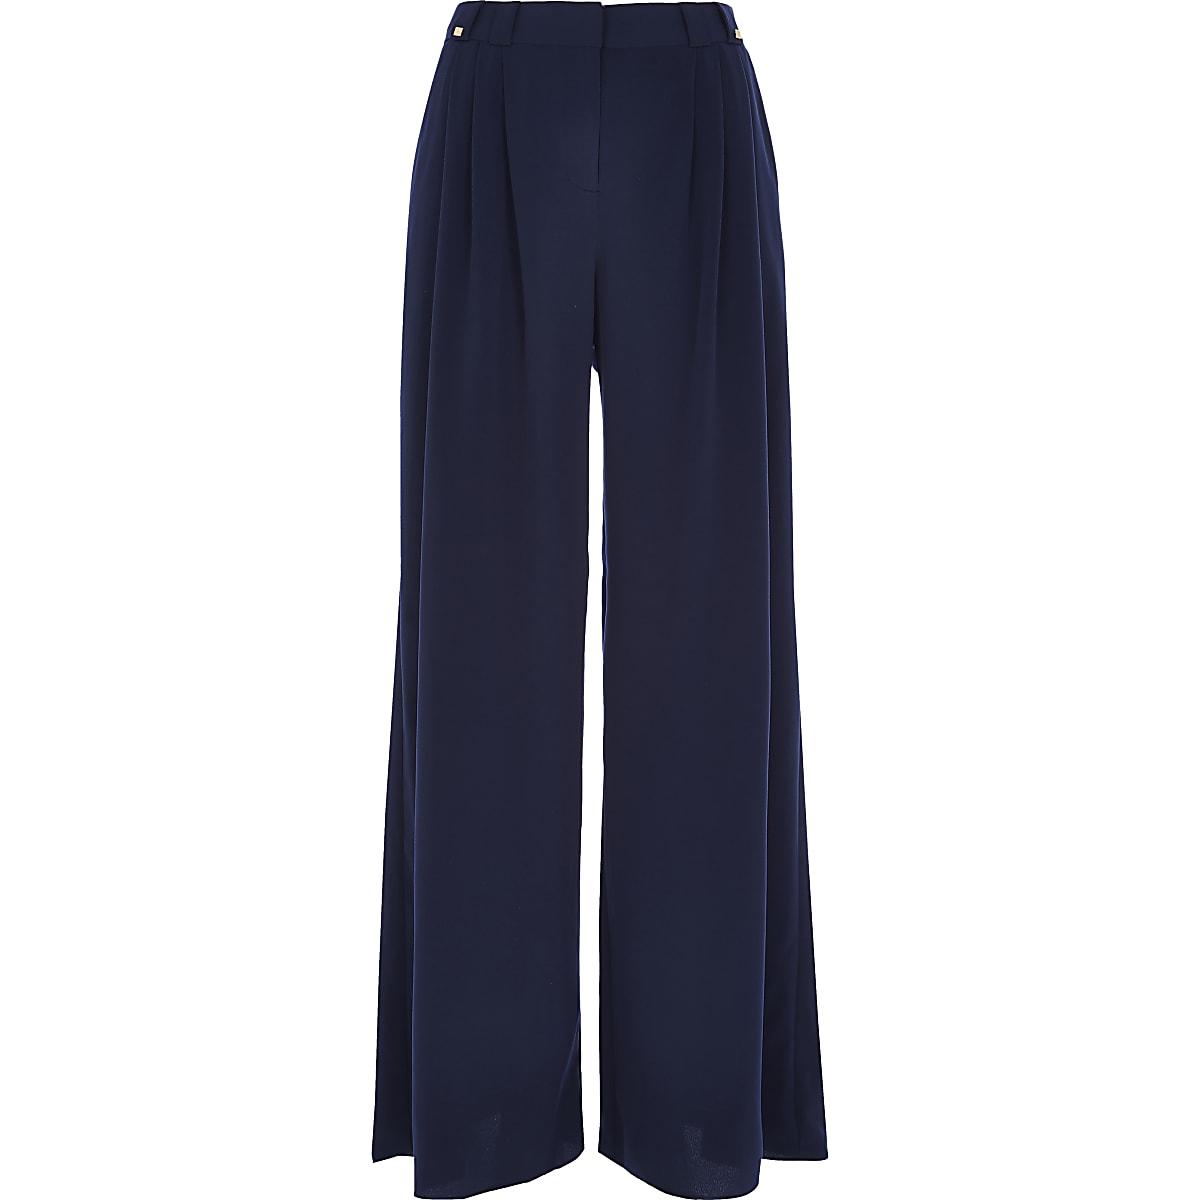 Navy pleated wide leg pants